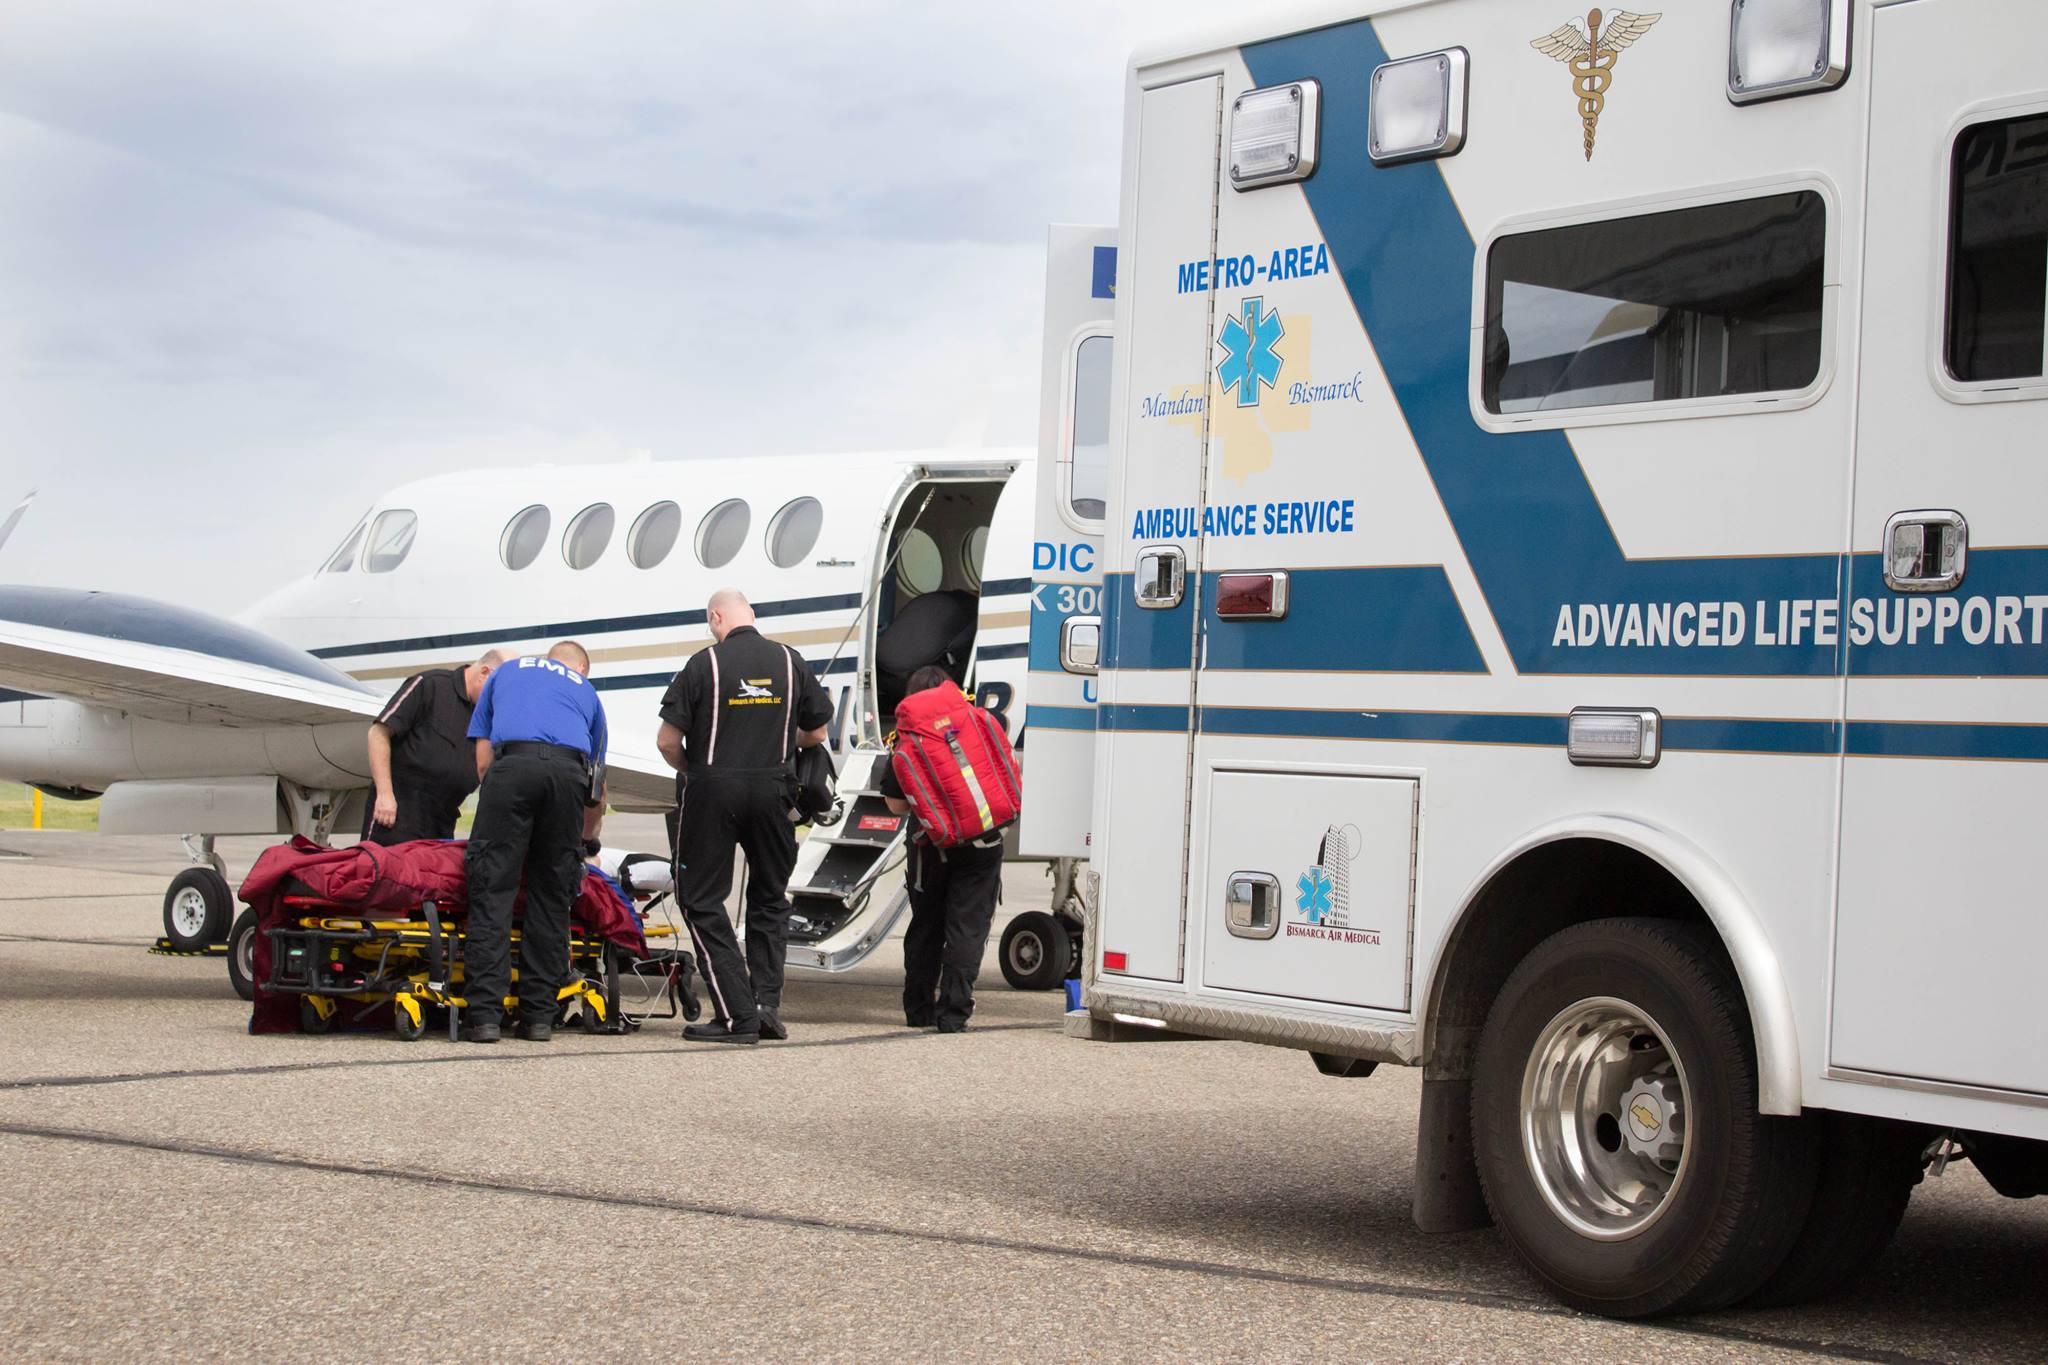 North Dakota plane crash: Three dead as air ambulance crashes near Bismarck